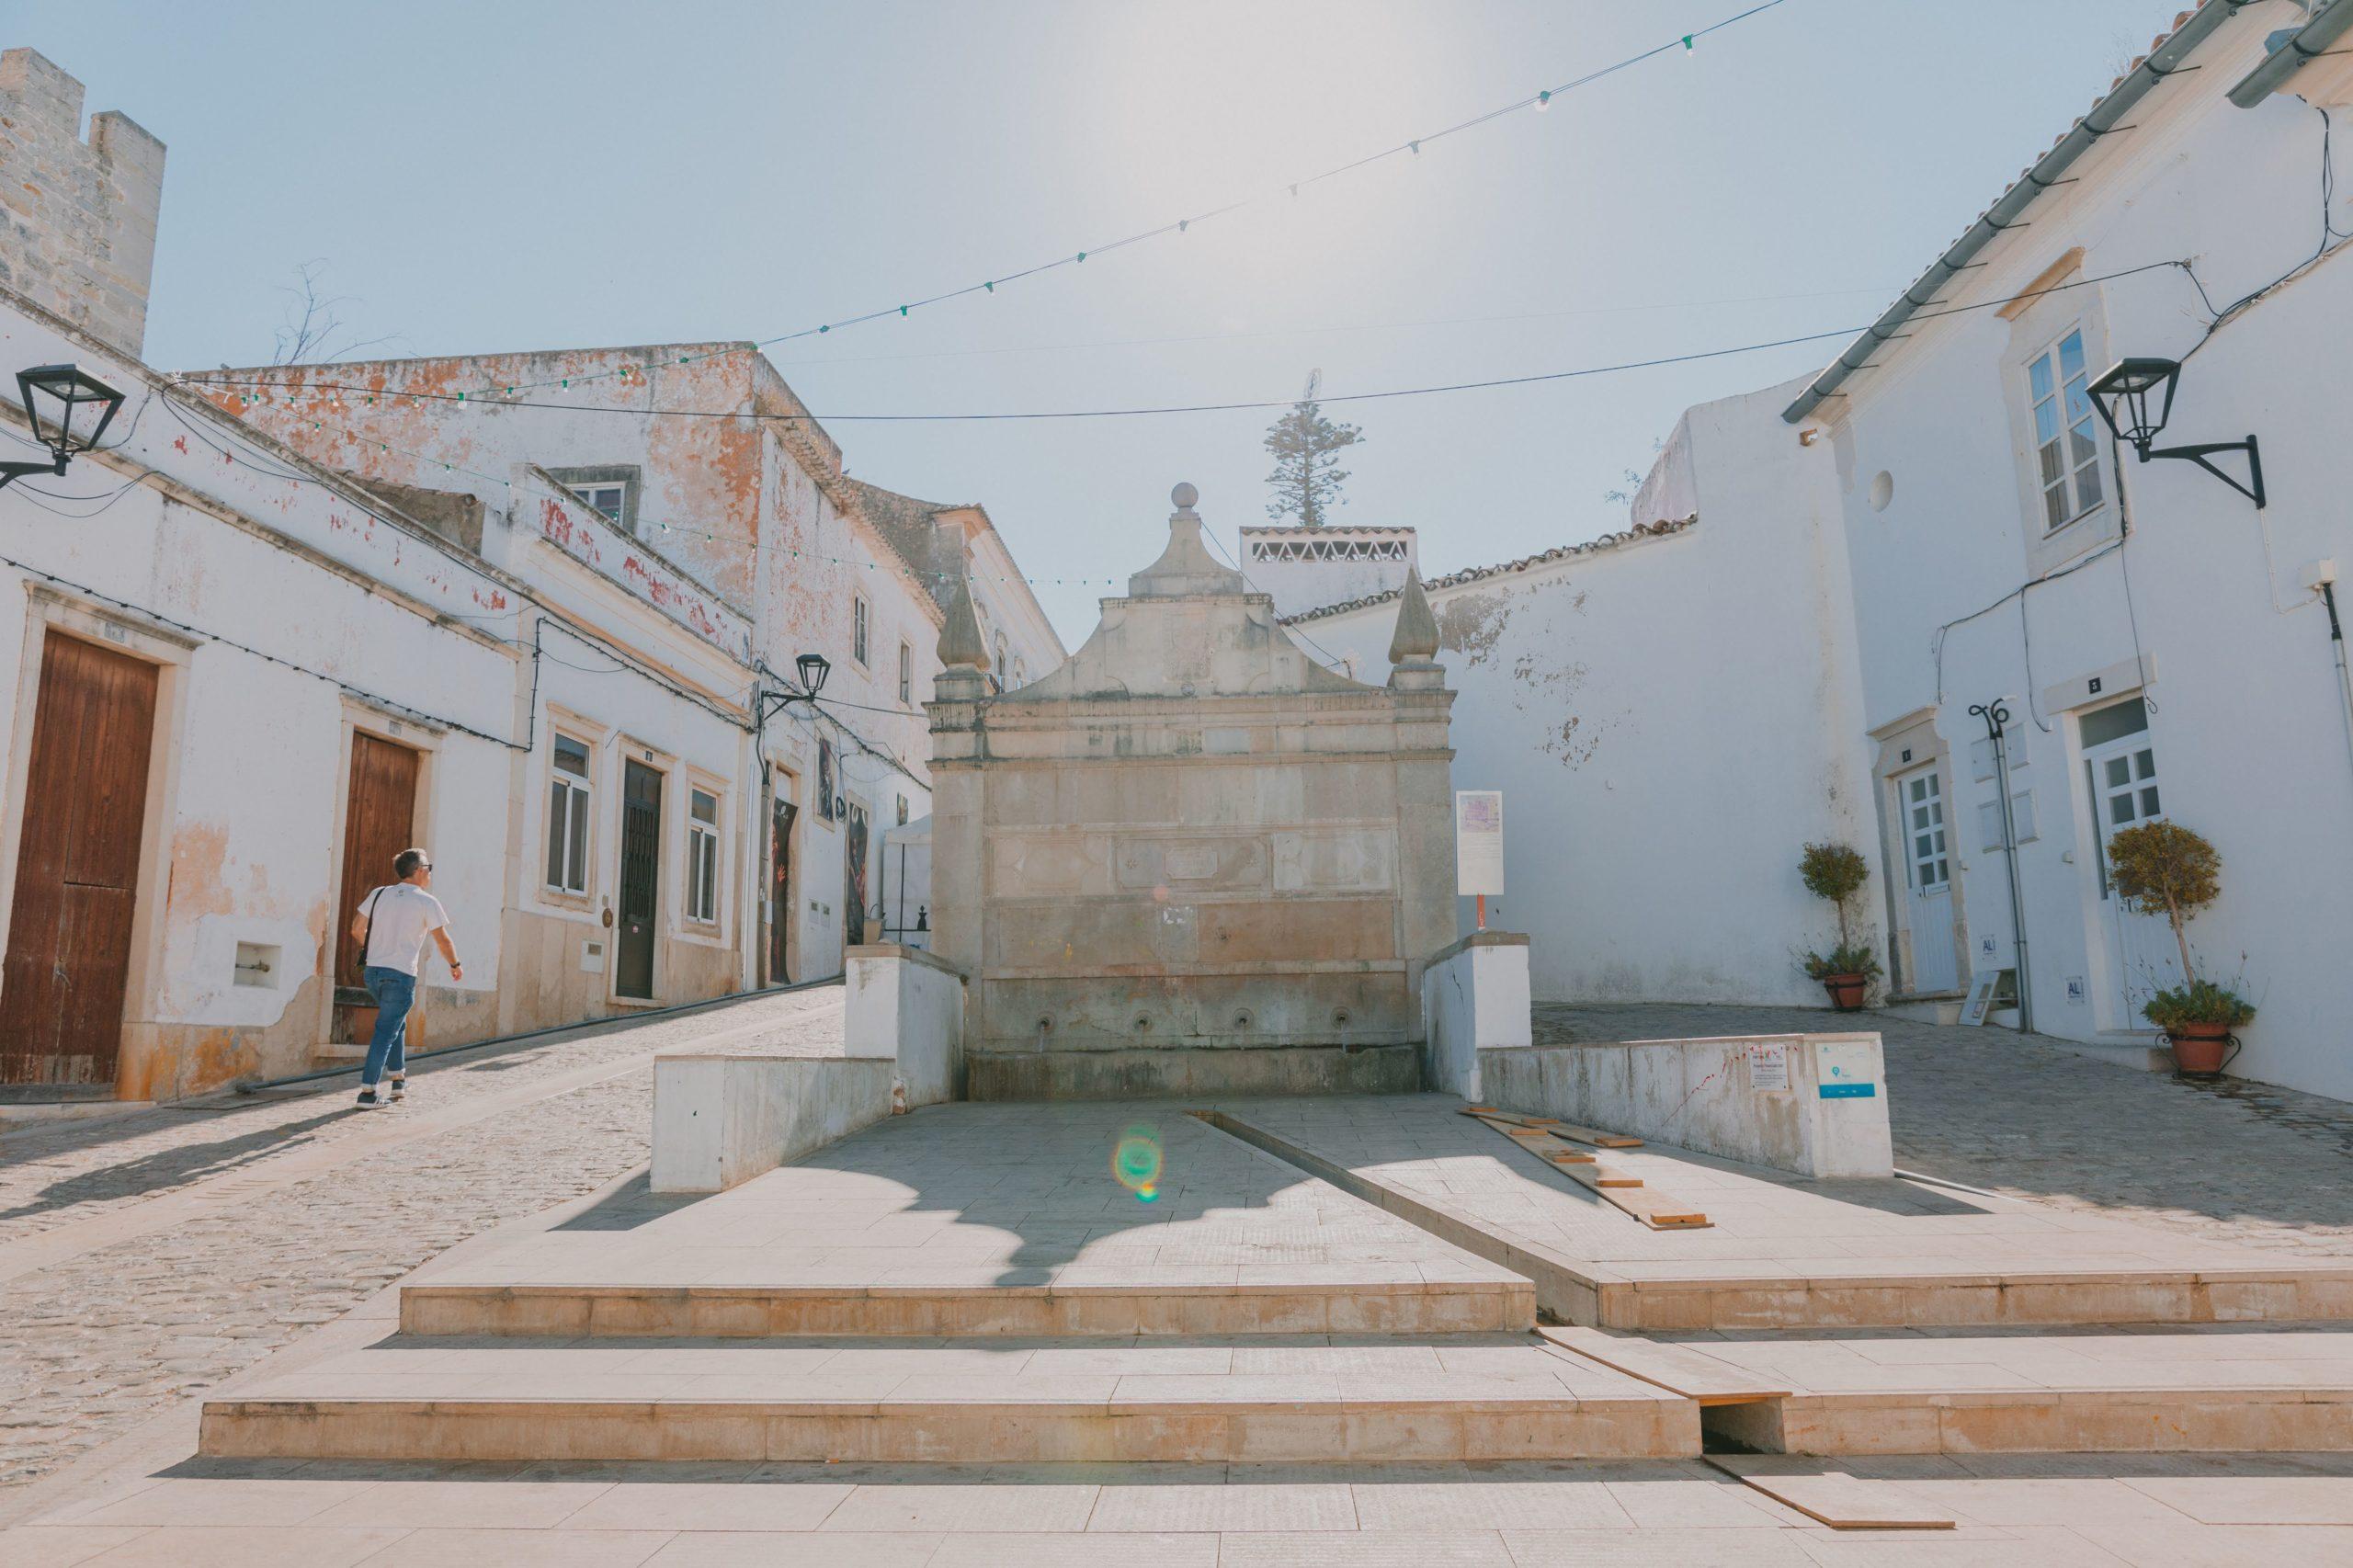 Take a walk around the narrow streets in Algarve